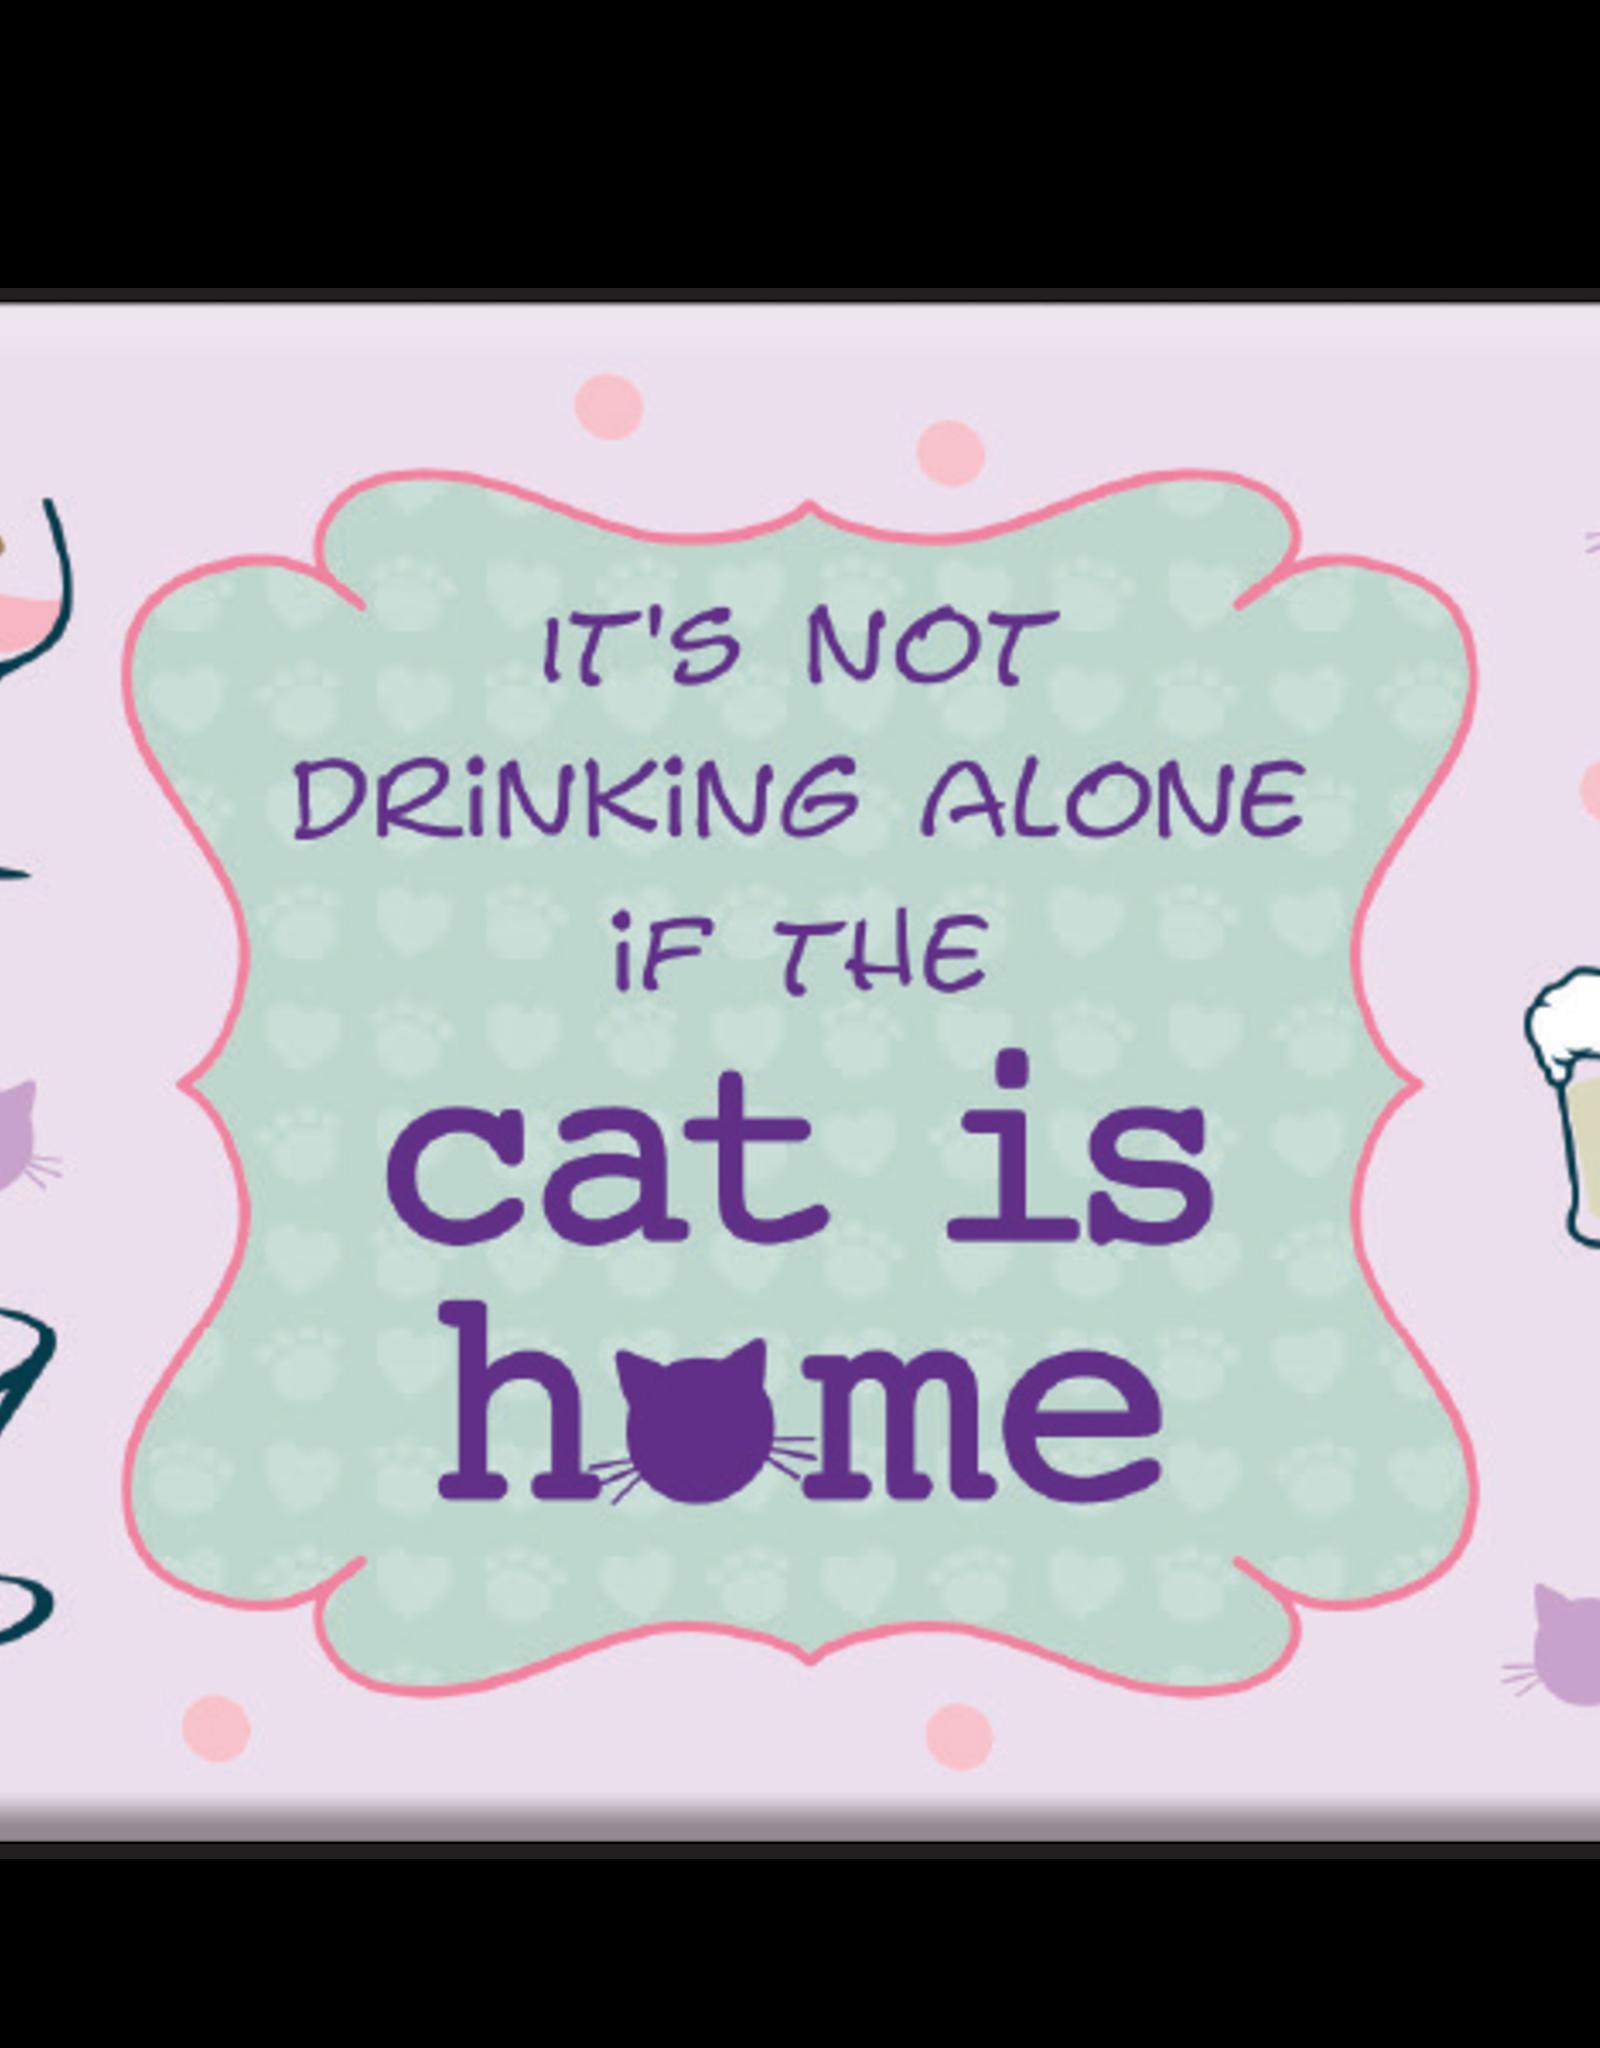 Dog Speak Dog Speak Refrigerator Magnet - It's Not Drinking Alone if the Cat is Home